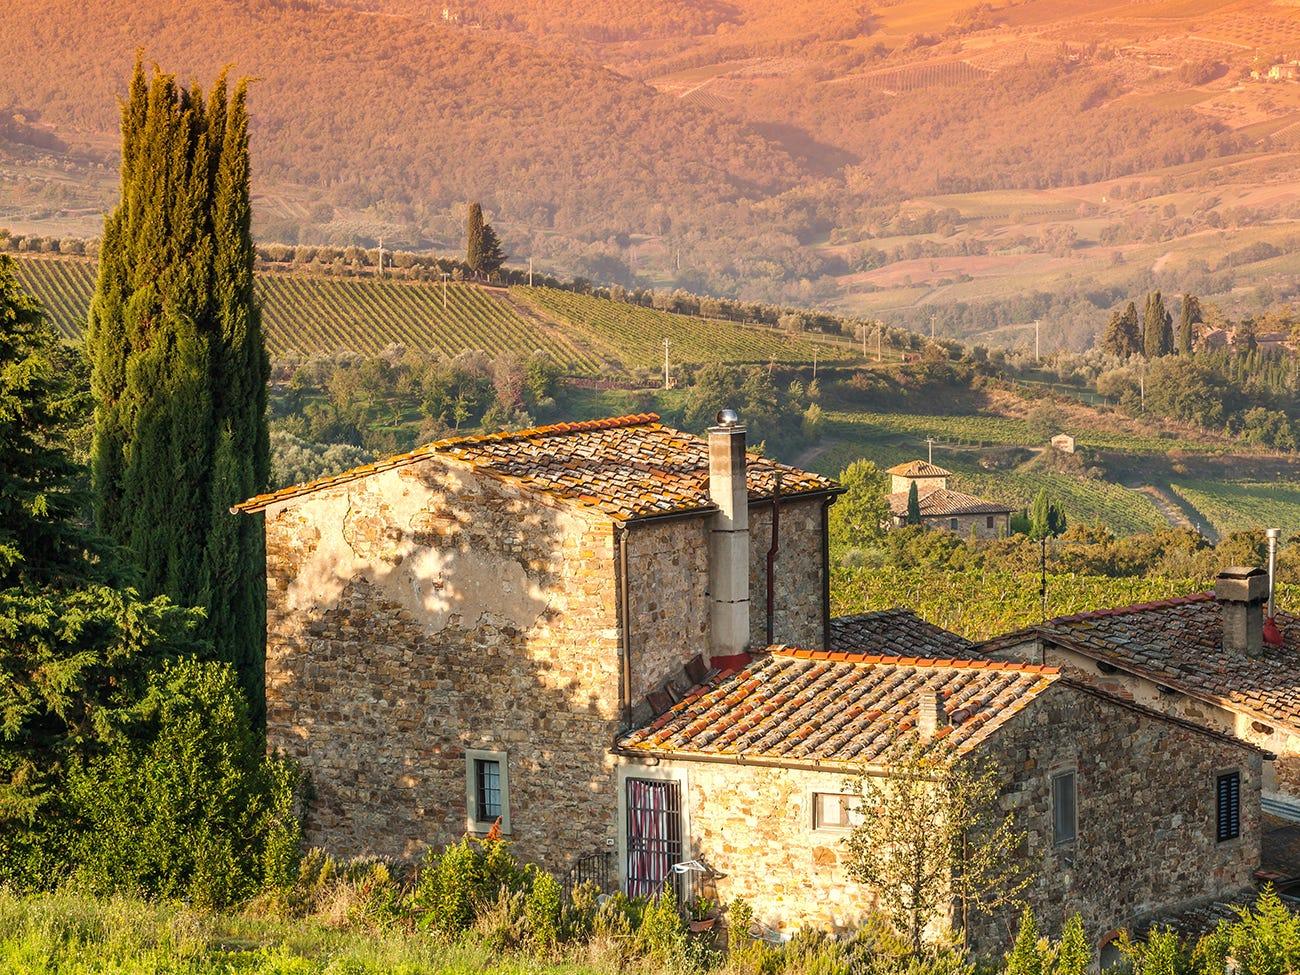 Domaine viticole de Toscane